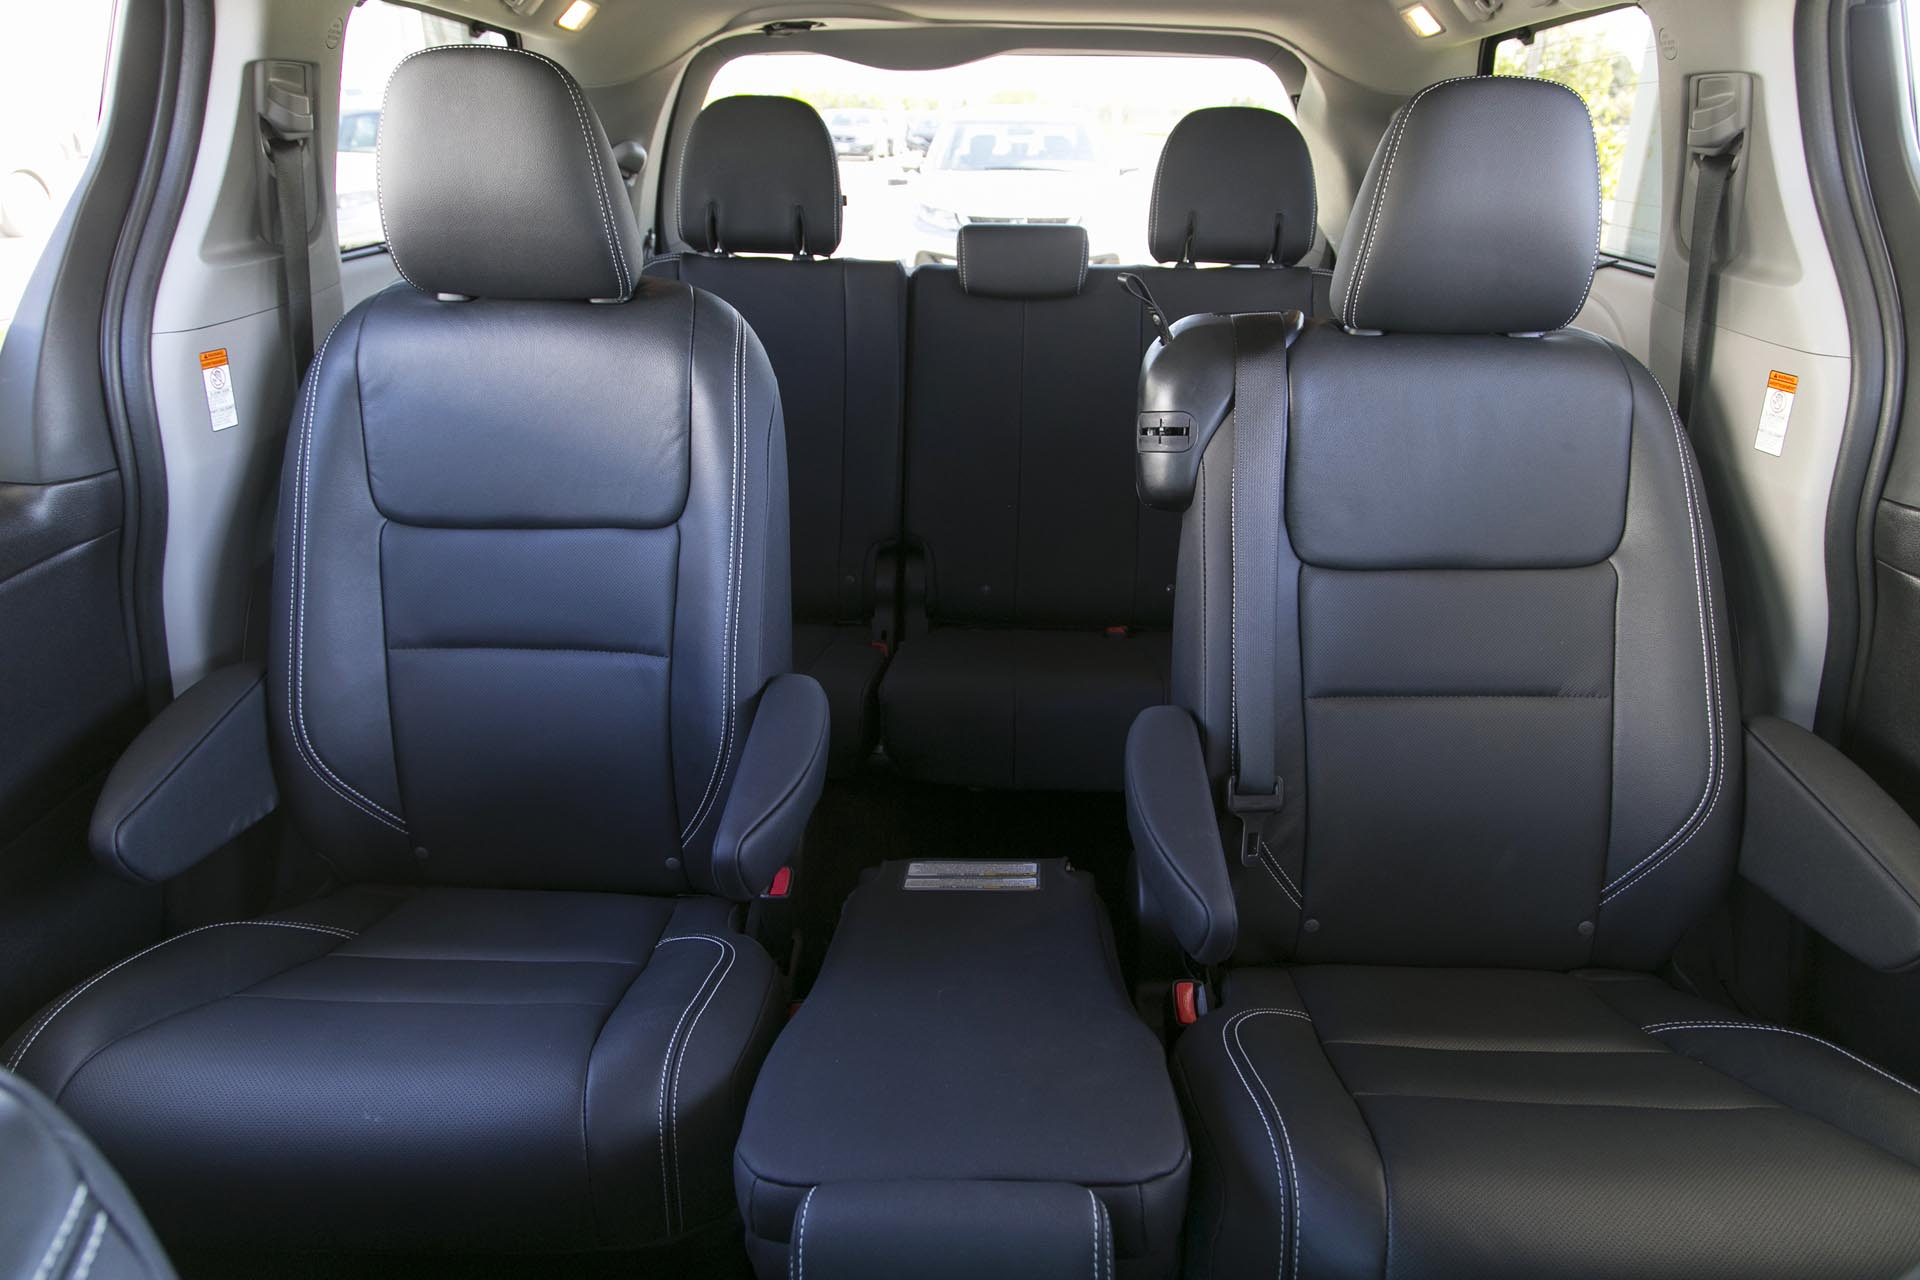 l com photos steering wheel sienna automotive passenger interior toyota photo minivan